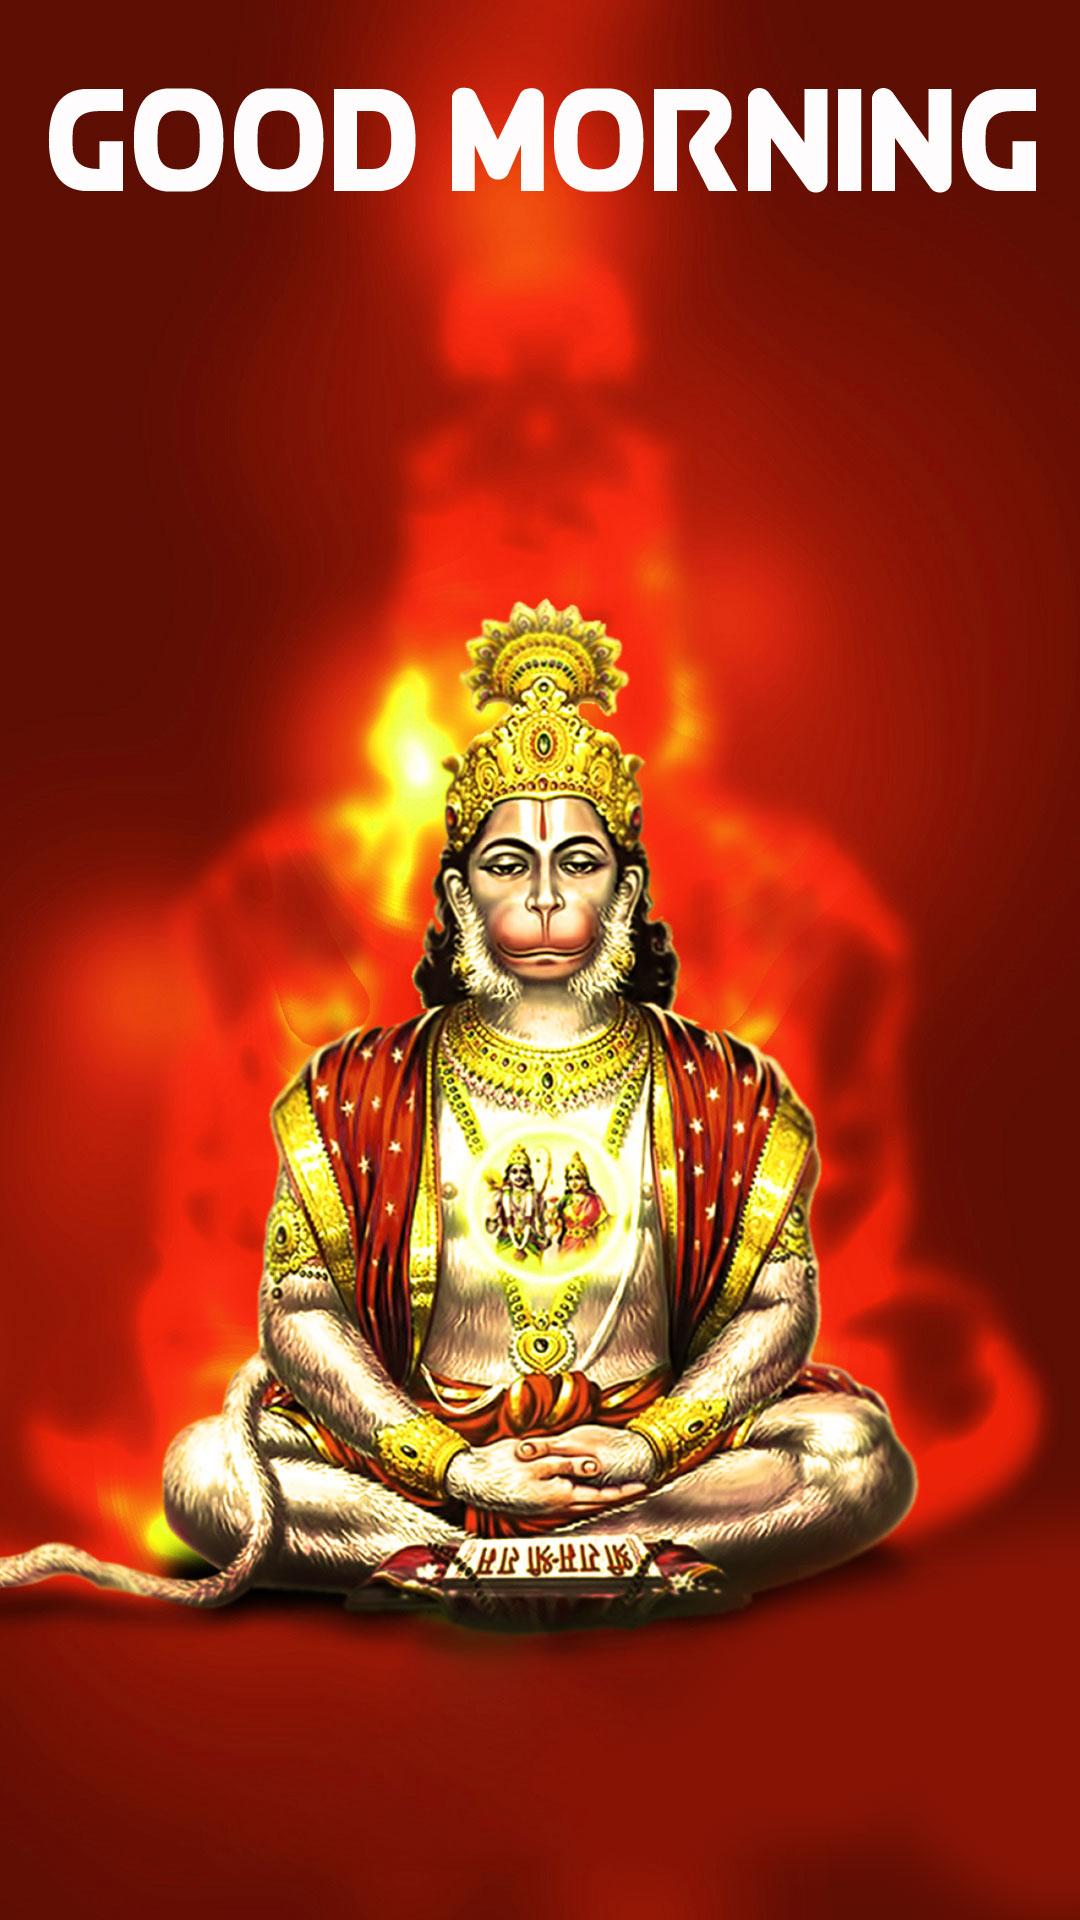 Free HD 2021 hanuman ji Good Morning Images